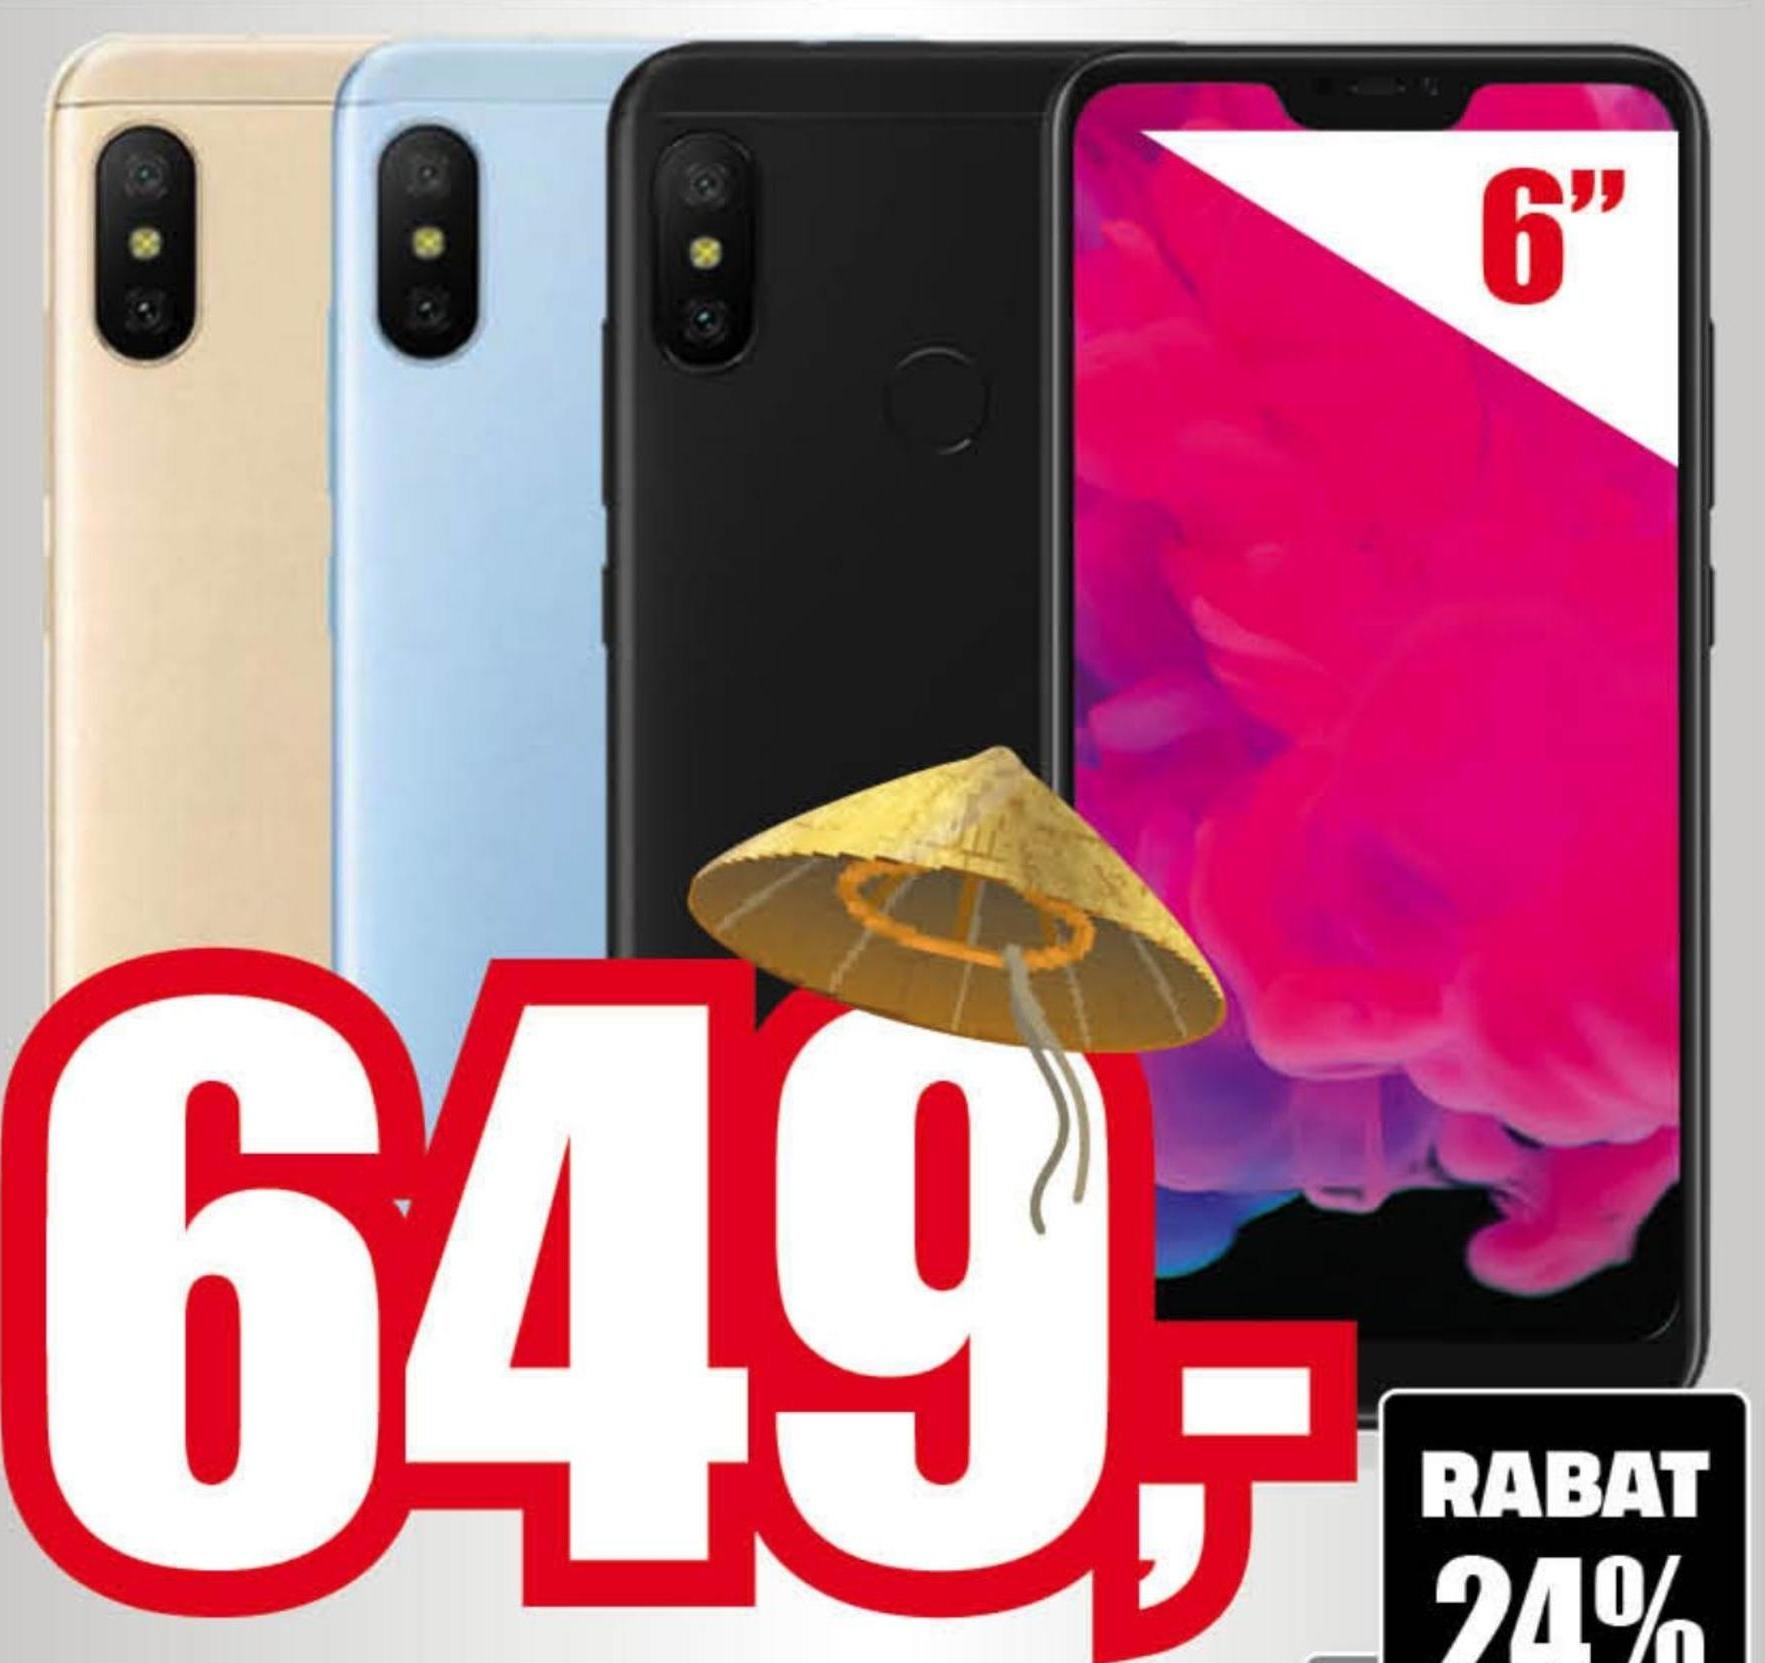 Smartfon MI A2 Lite Xiaomi niska cena